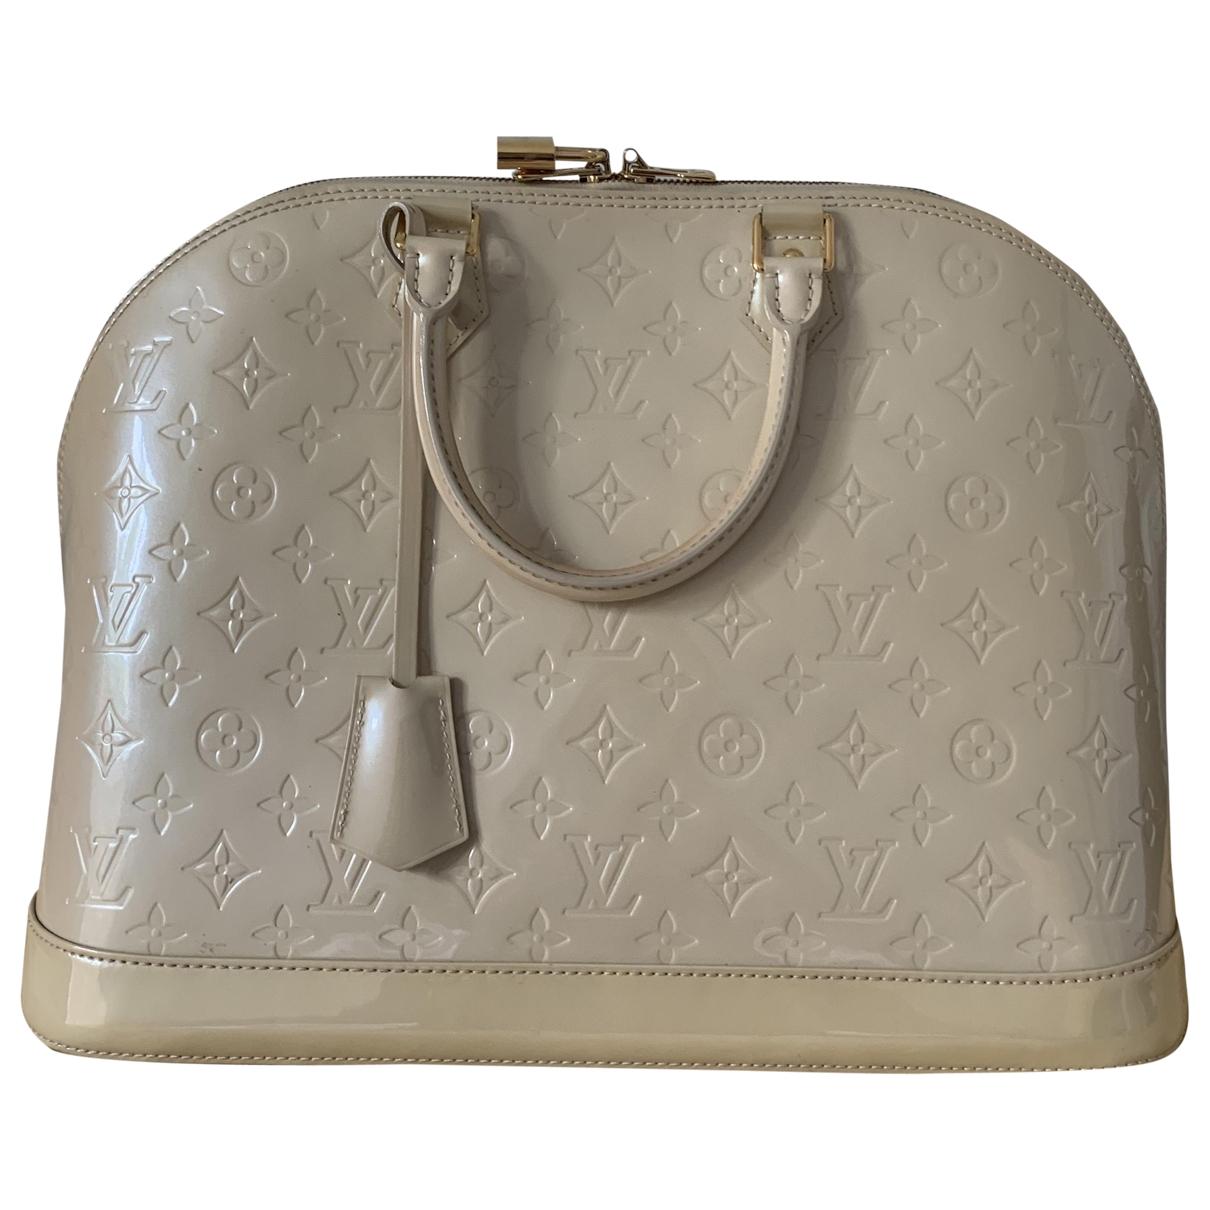 Louis Vuitton - Sac a main Alma pour femme en cuir - beige